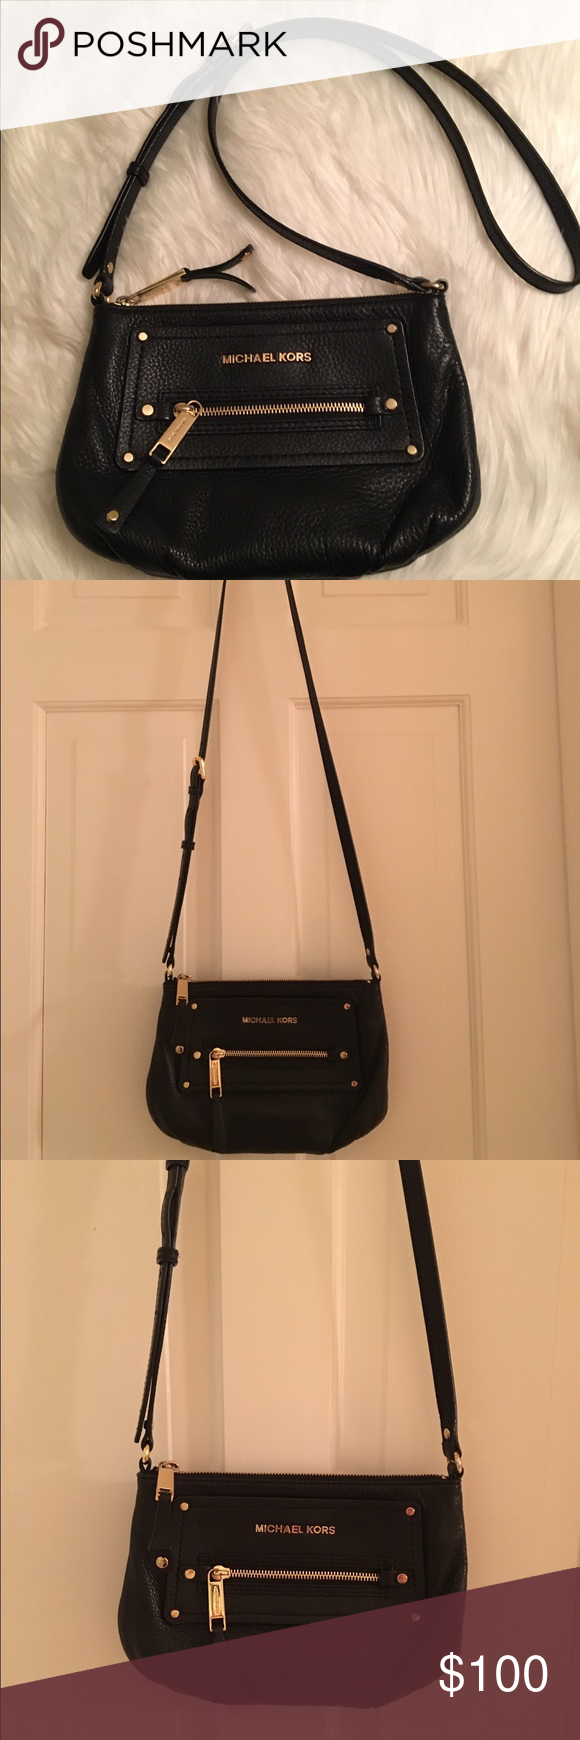 MICHAEL KORS black leather cross body purse MICHAEL KORS black leather cross body purse. Excellent condition! Smoke free home MICHAEL Michael Kors Bags Crossbody Bags